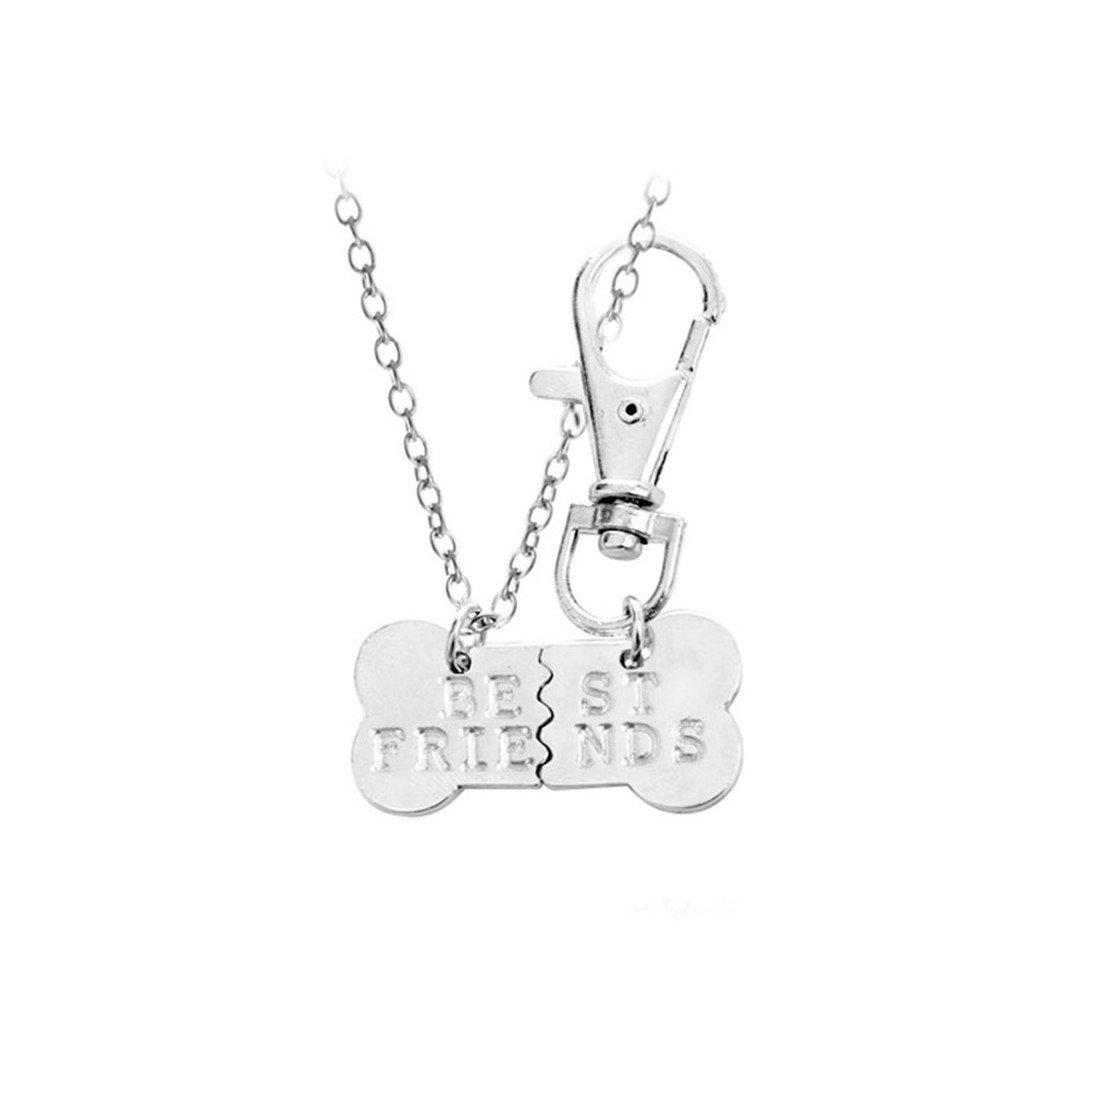 UNKE 2 Pcs Set Dog Bone Shaped Best Friends Charm Pendant Necklace Keychain Gift for Friends Dog Lover,Silver